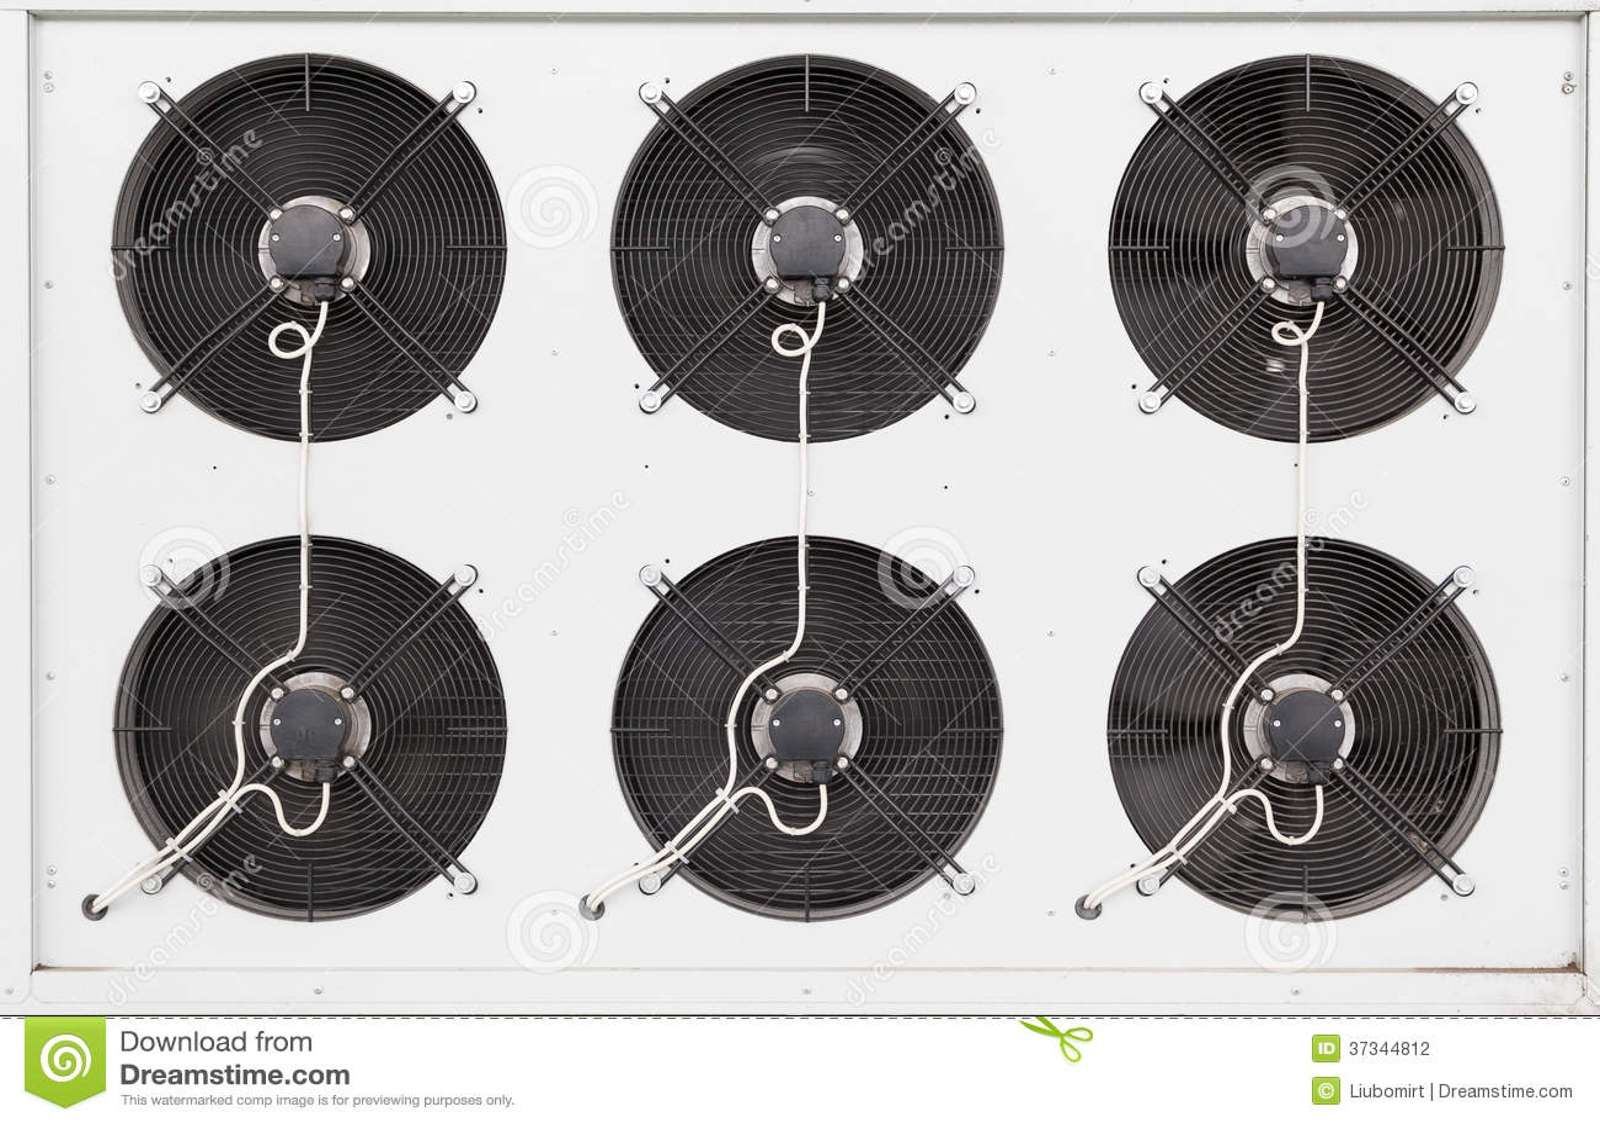 Industriella luftkonditioneringsapparatfans